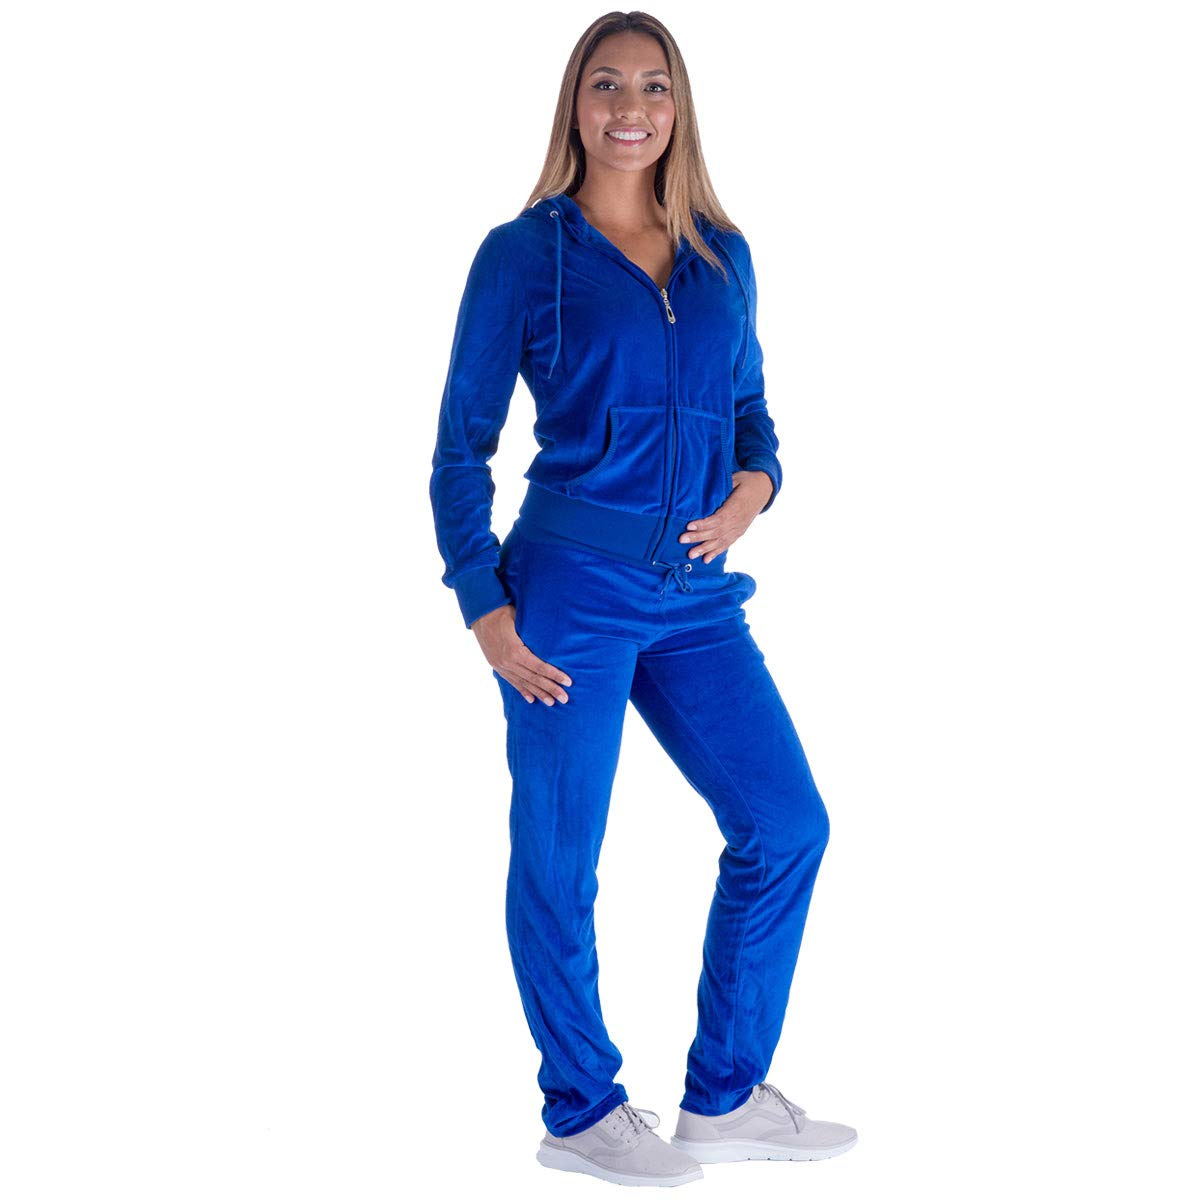 Leehanton Velour Tracksuit Womens 2 Pieces Outfits Set Zipper Hoodie and Sweatpants Solid Jogging Suits